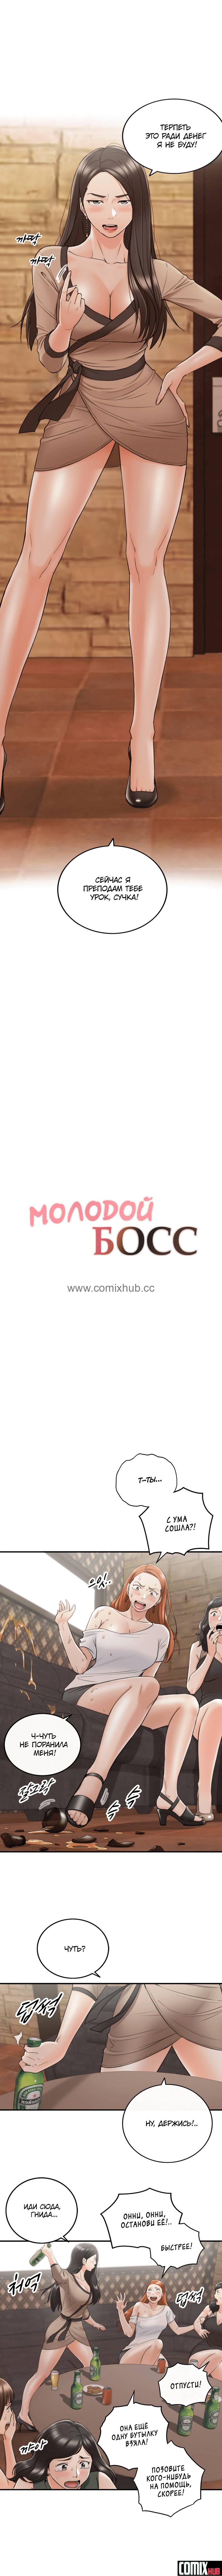 Манхва Молодой босс, часть 43 Большая грудь, Измена, Хентай манга, манхва